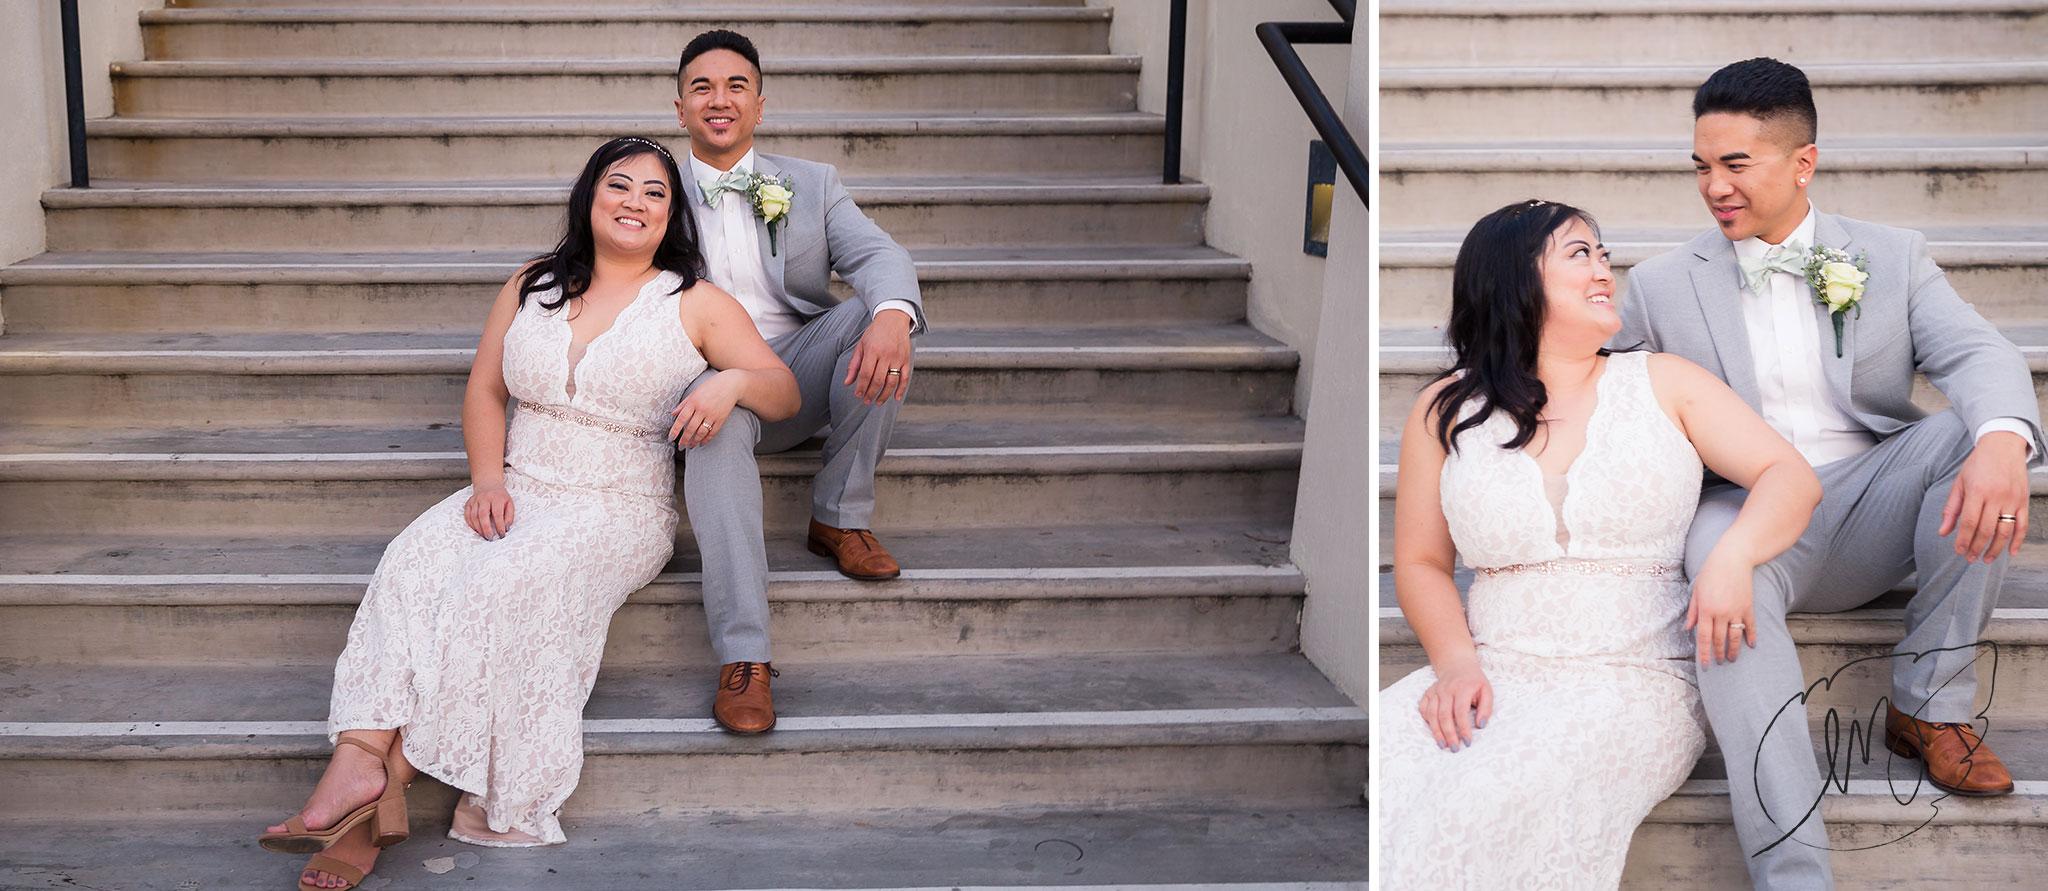 California_Orange_County_Wedding_Photographer_46.jpg